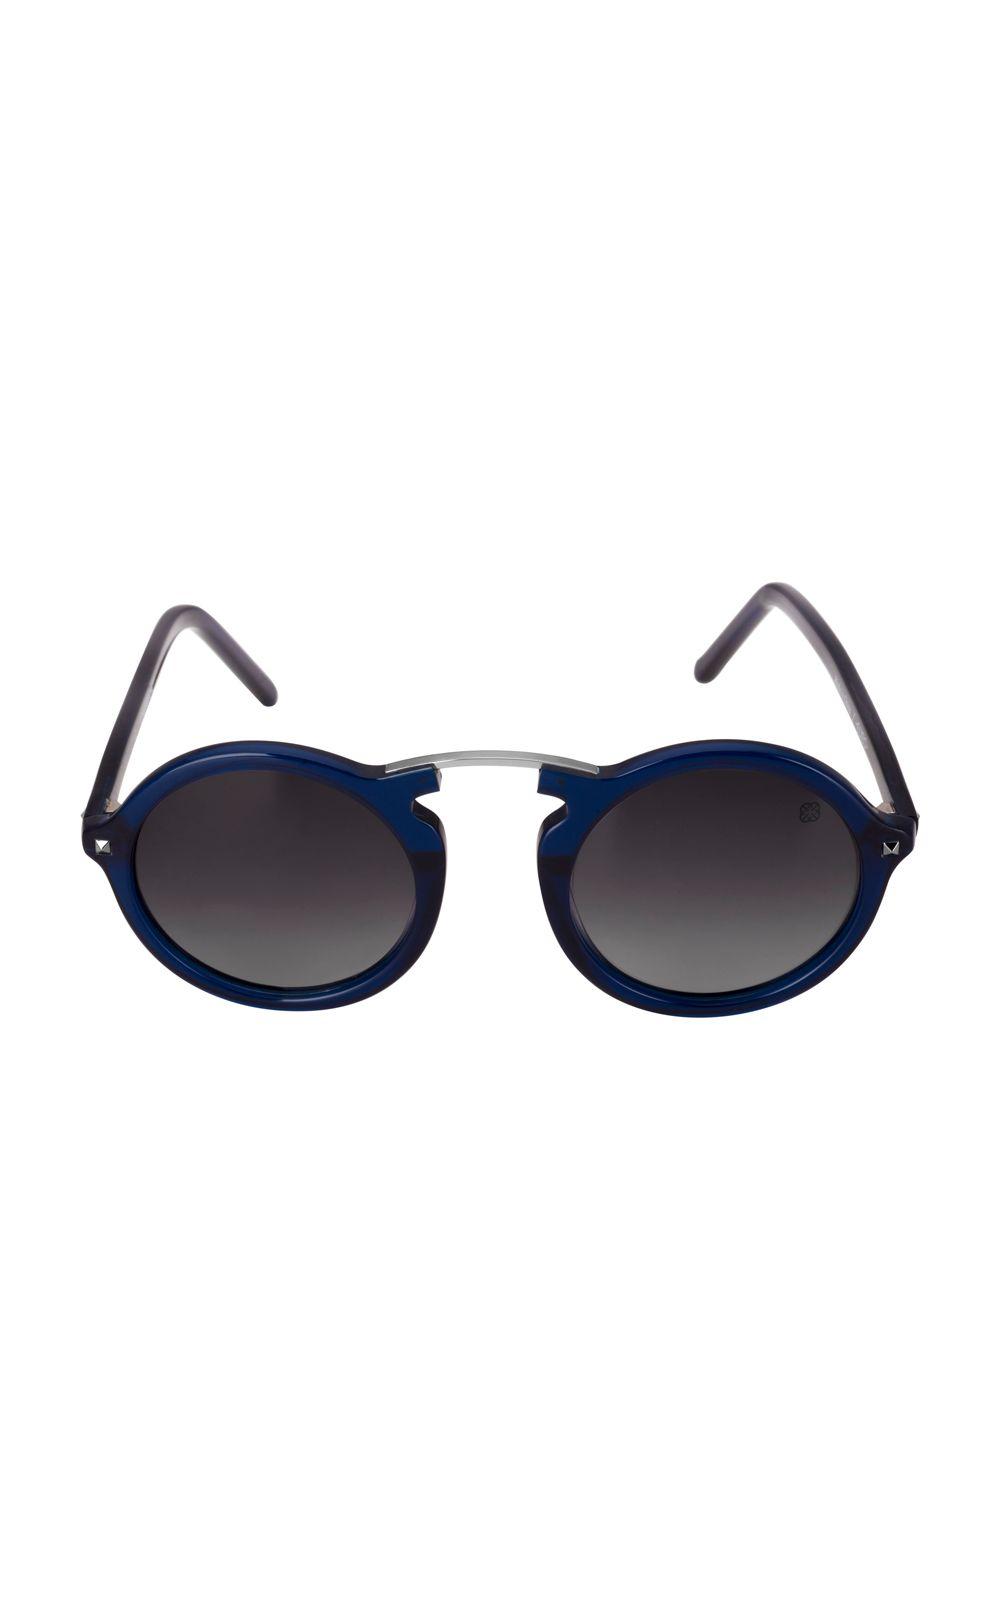 Foto 1 - Óculos Euro Casual Vintage Feminino Azul E0033K1547/8C